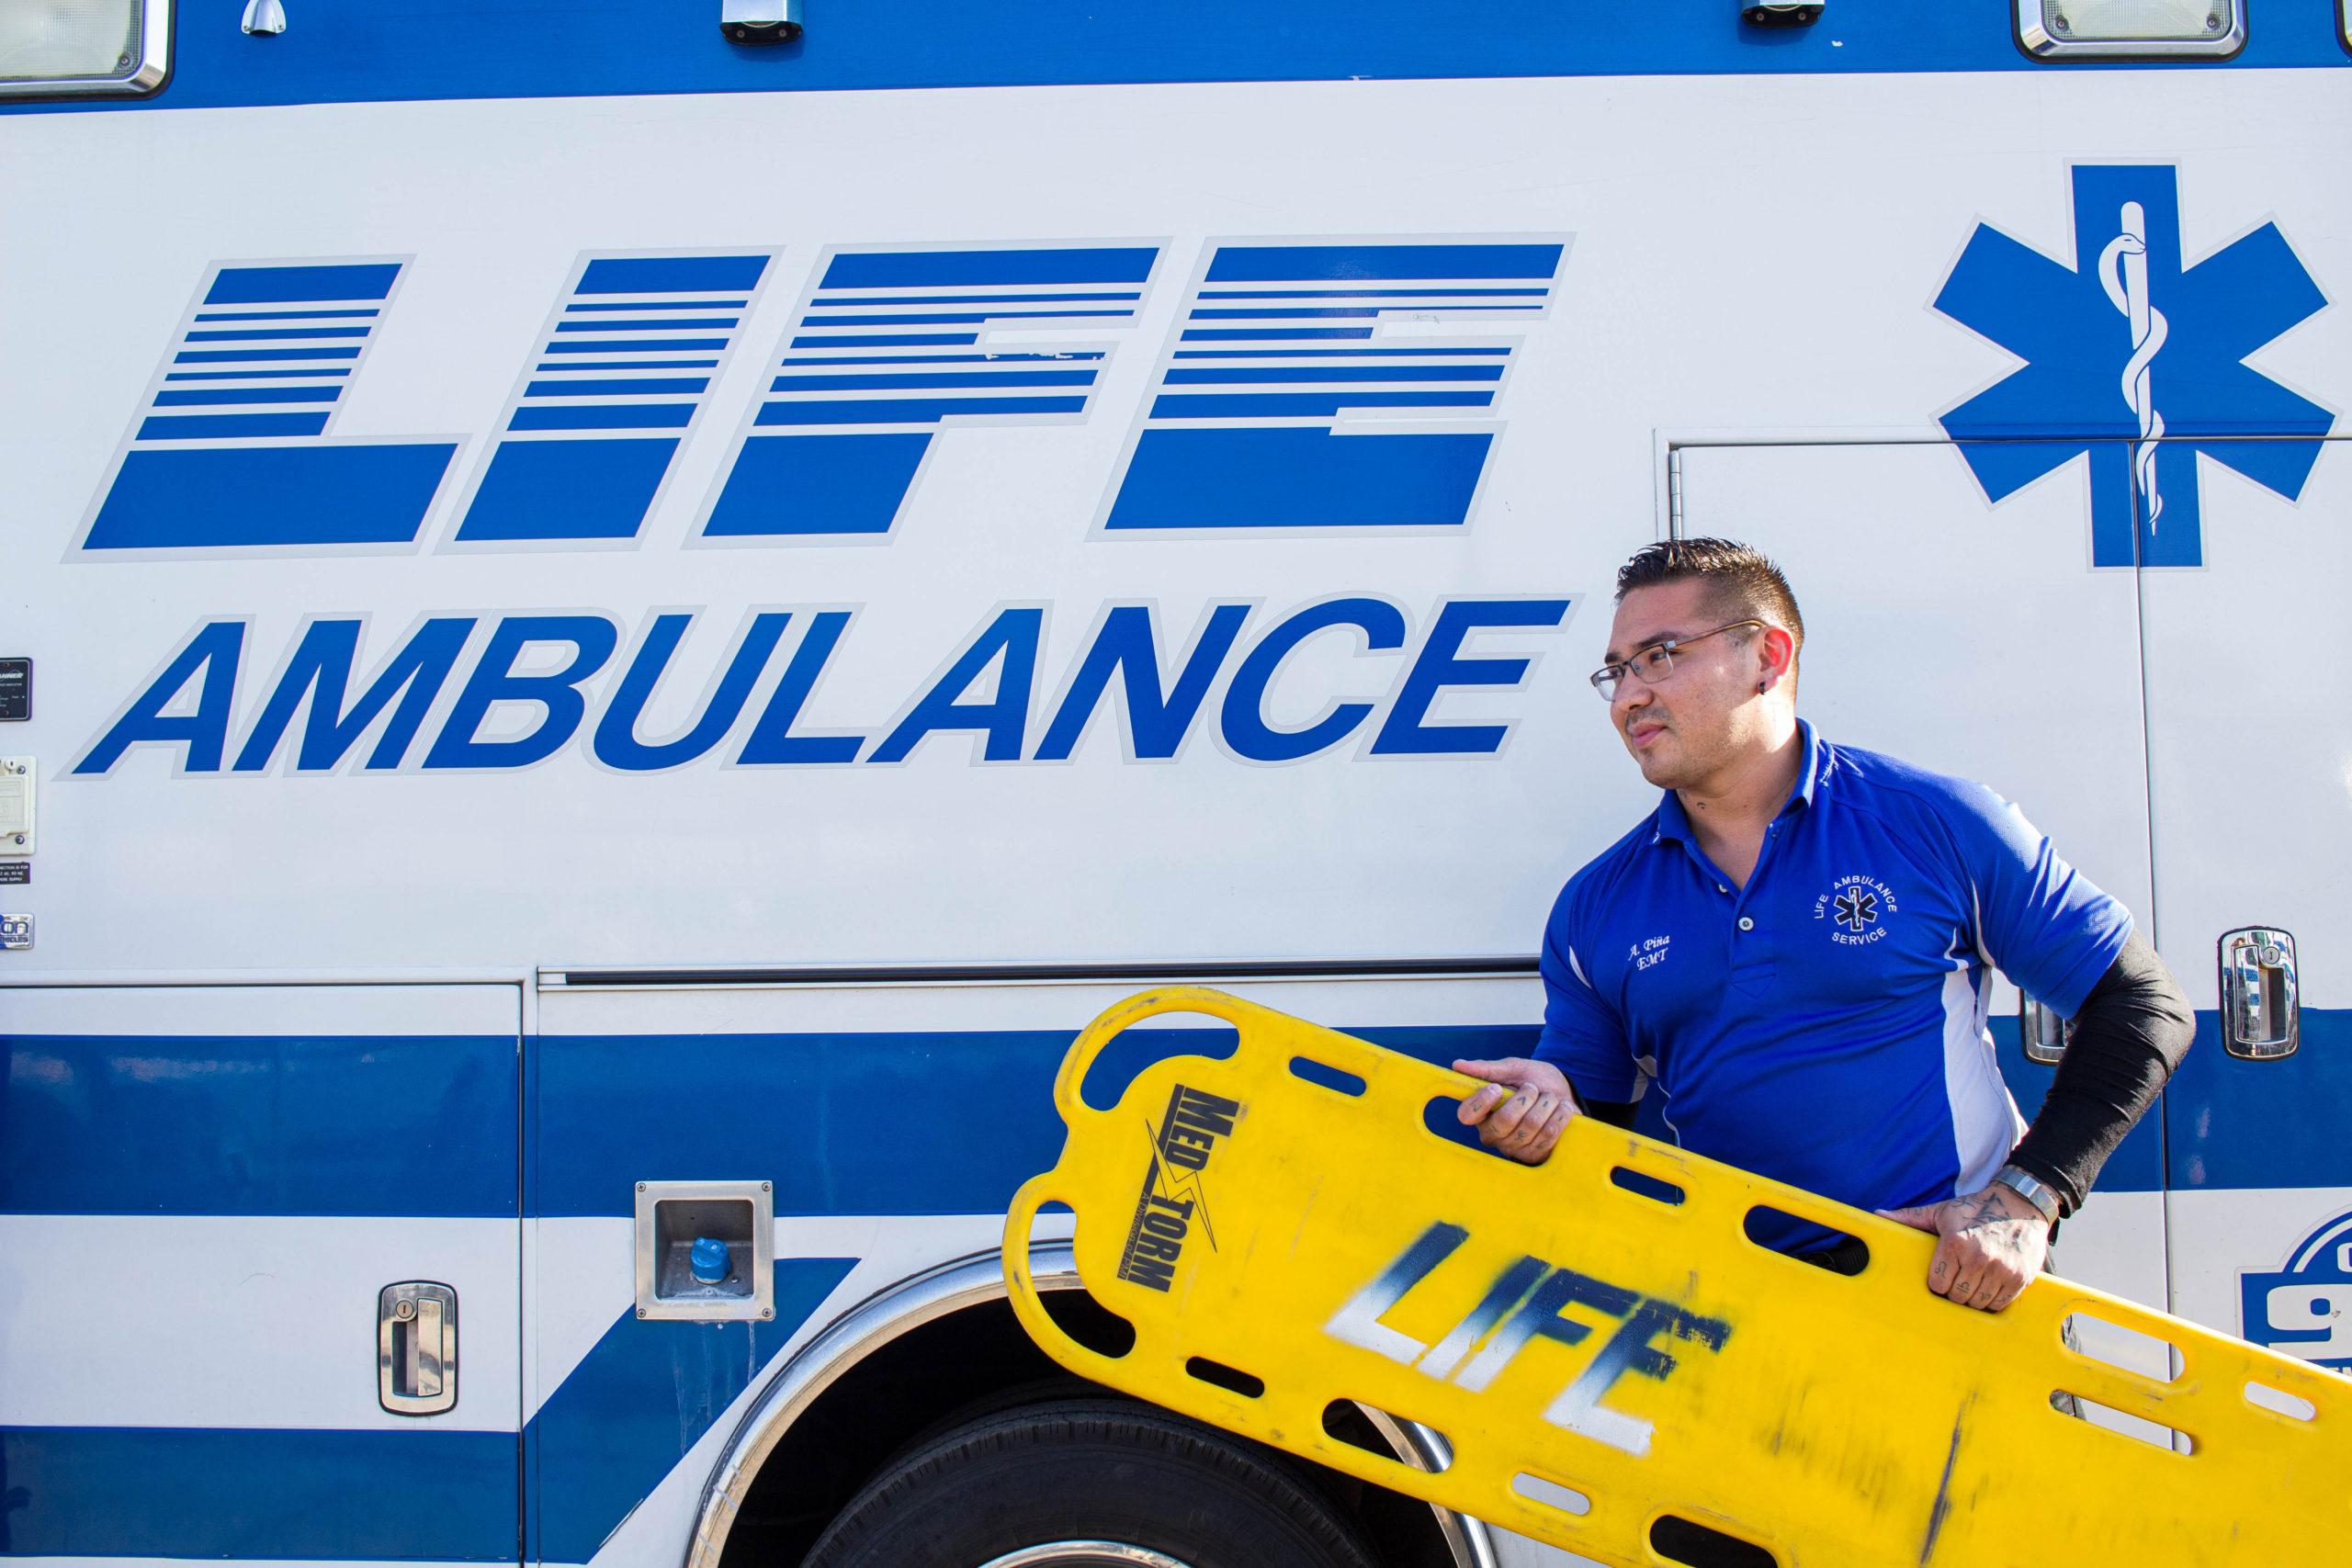 Life Ambulance El Paso Non Emergency Transportation